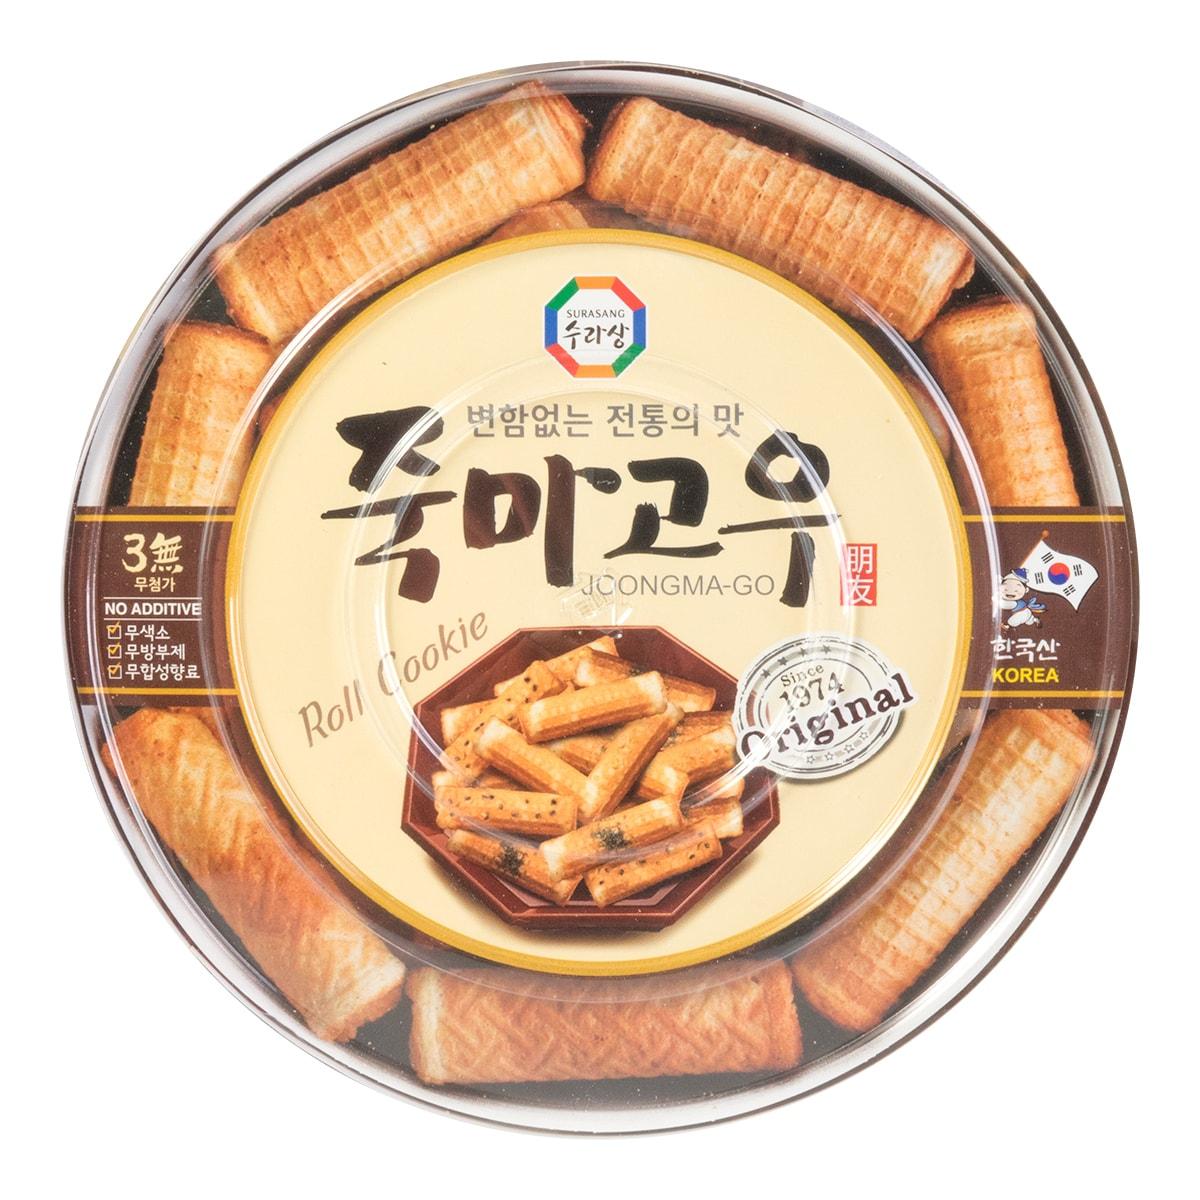 SURASANG JOONGMA-GO Black Sesame Roll Cookie Cracker 365g